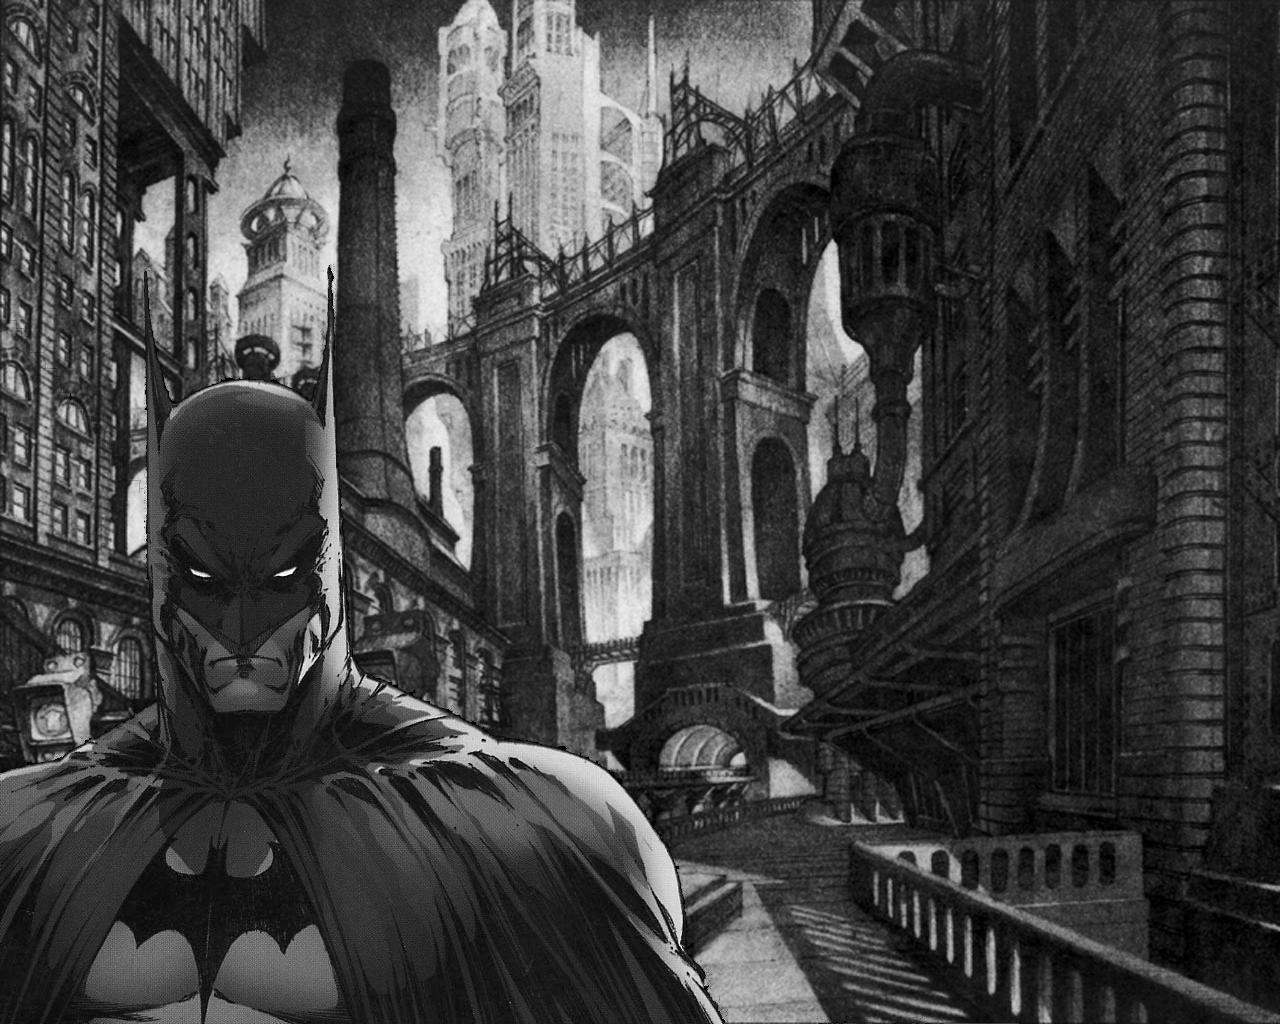 http://4.bp.blogspot.com/-I_c9QJA_jPI/ToGbZWOTIUI/AAAAAAAAAFk/gRENTVGqgPA/s1600/batman-cartoon-wallpaper-22-772260.jpg